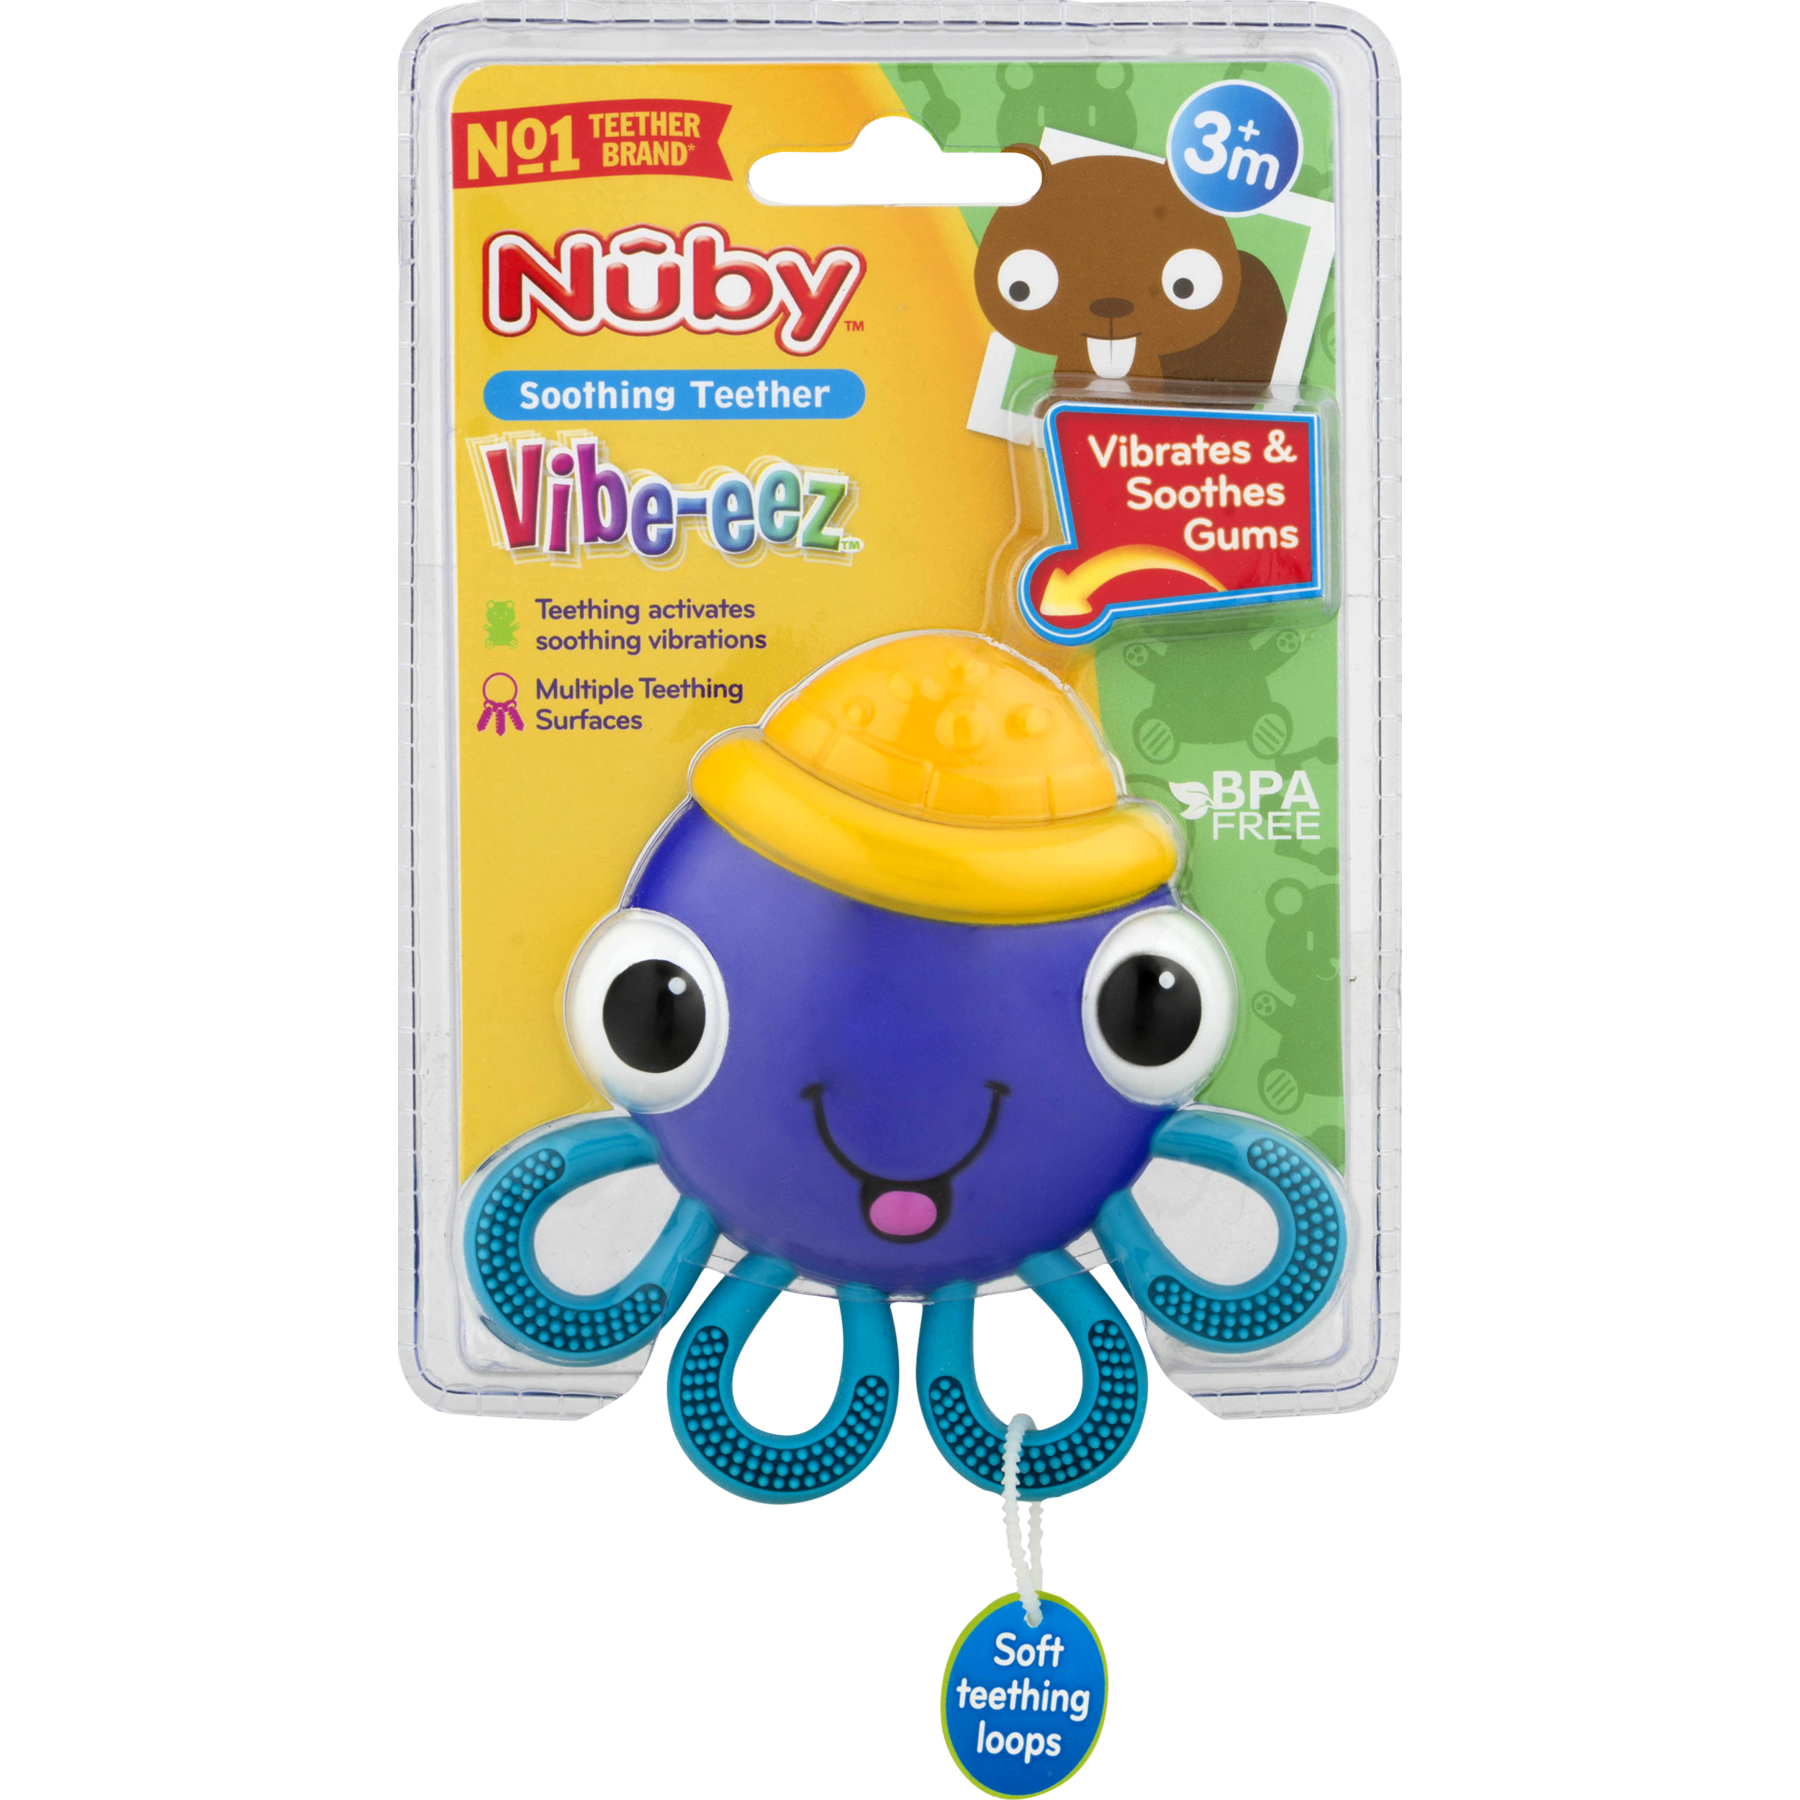 Nuby Vibe-eez Soothing Teether, Octopus - Walmart.com - Walmart.com